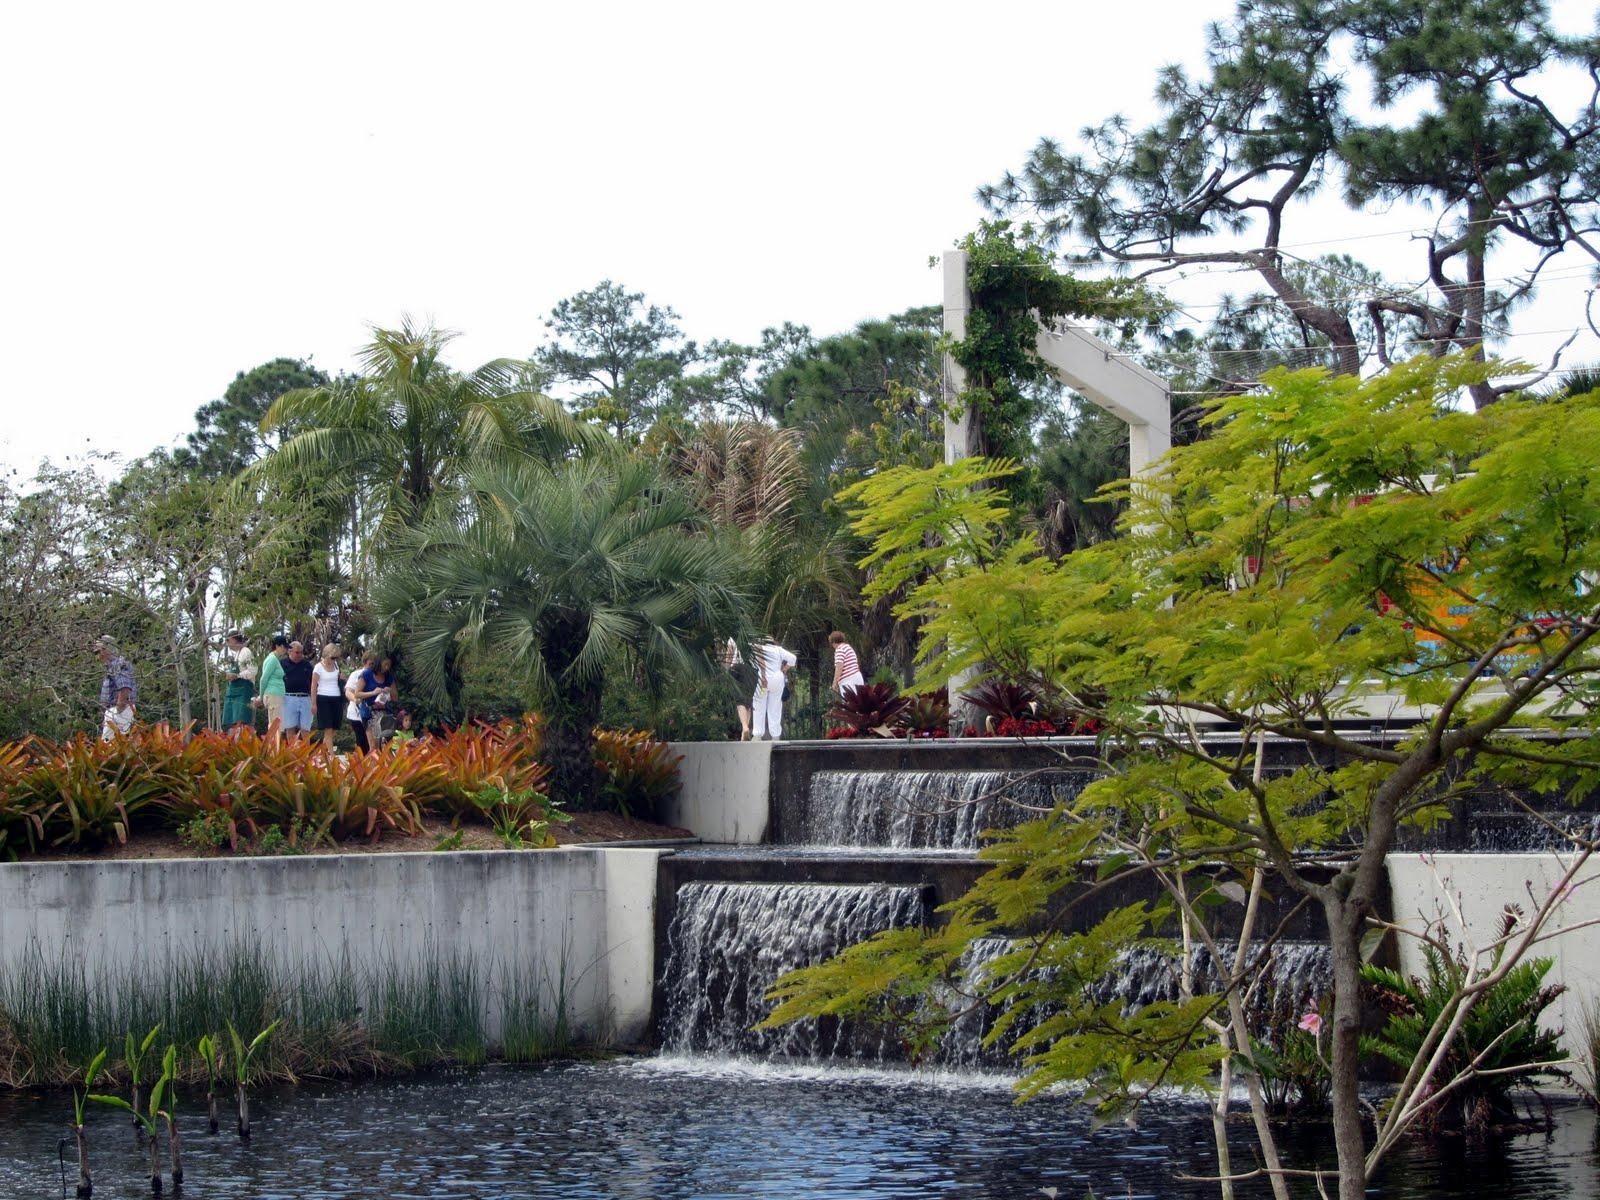 Islandscapes Naples Botanical Garden